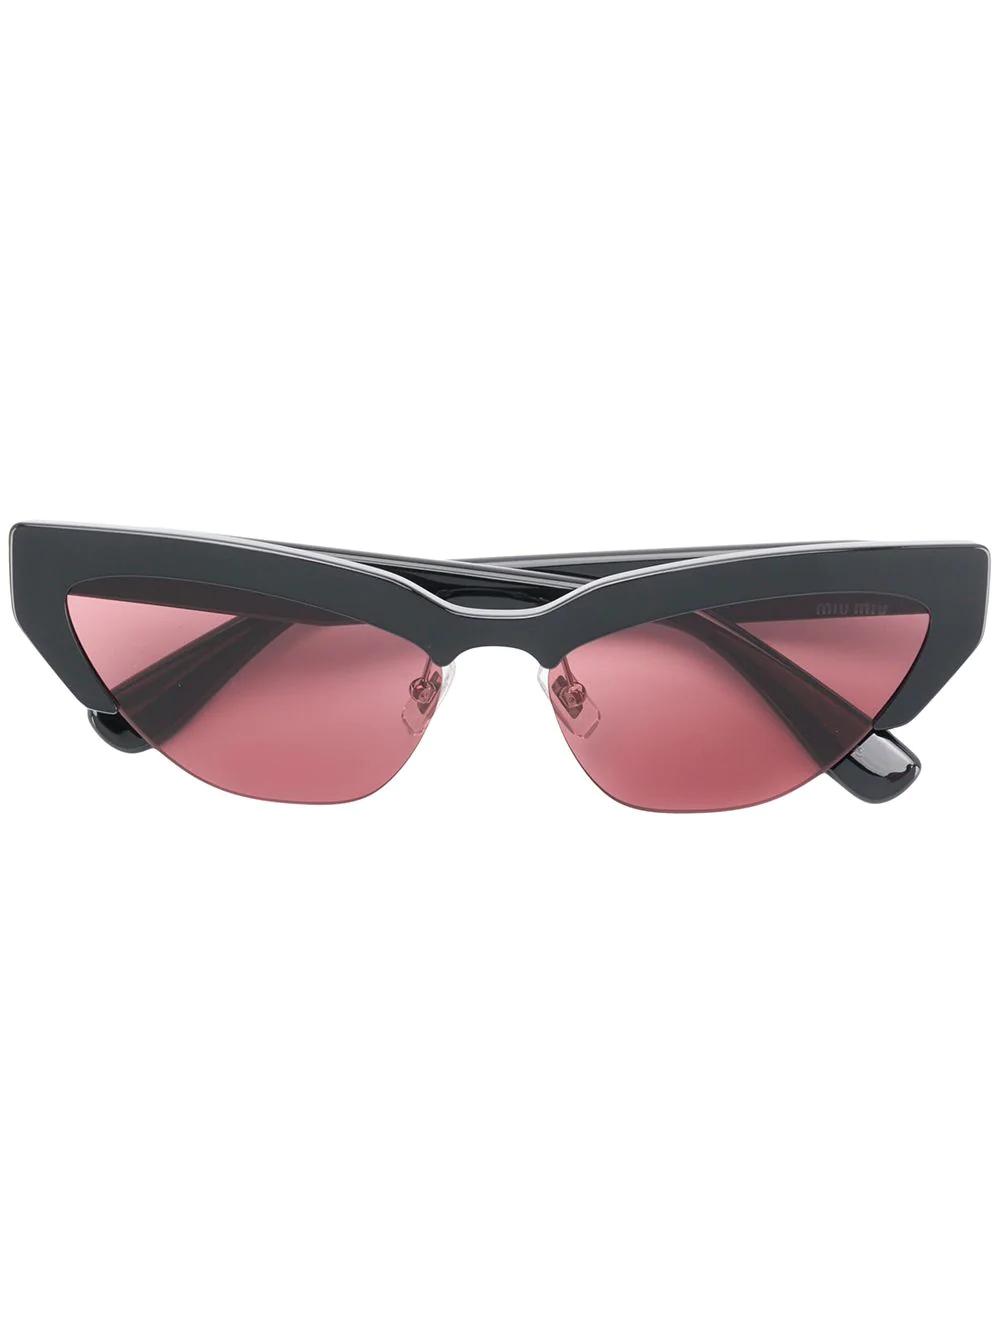 "MIU MIU | солнцезащитные очки """"кошачий глаз | Clouty"